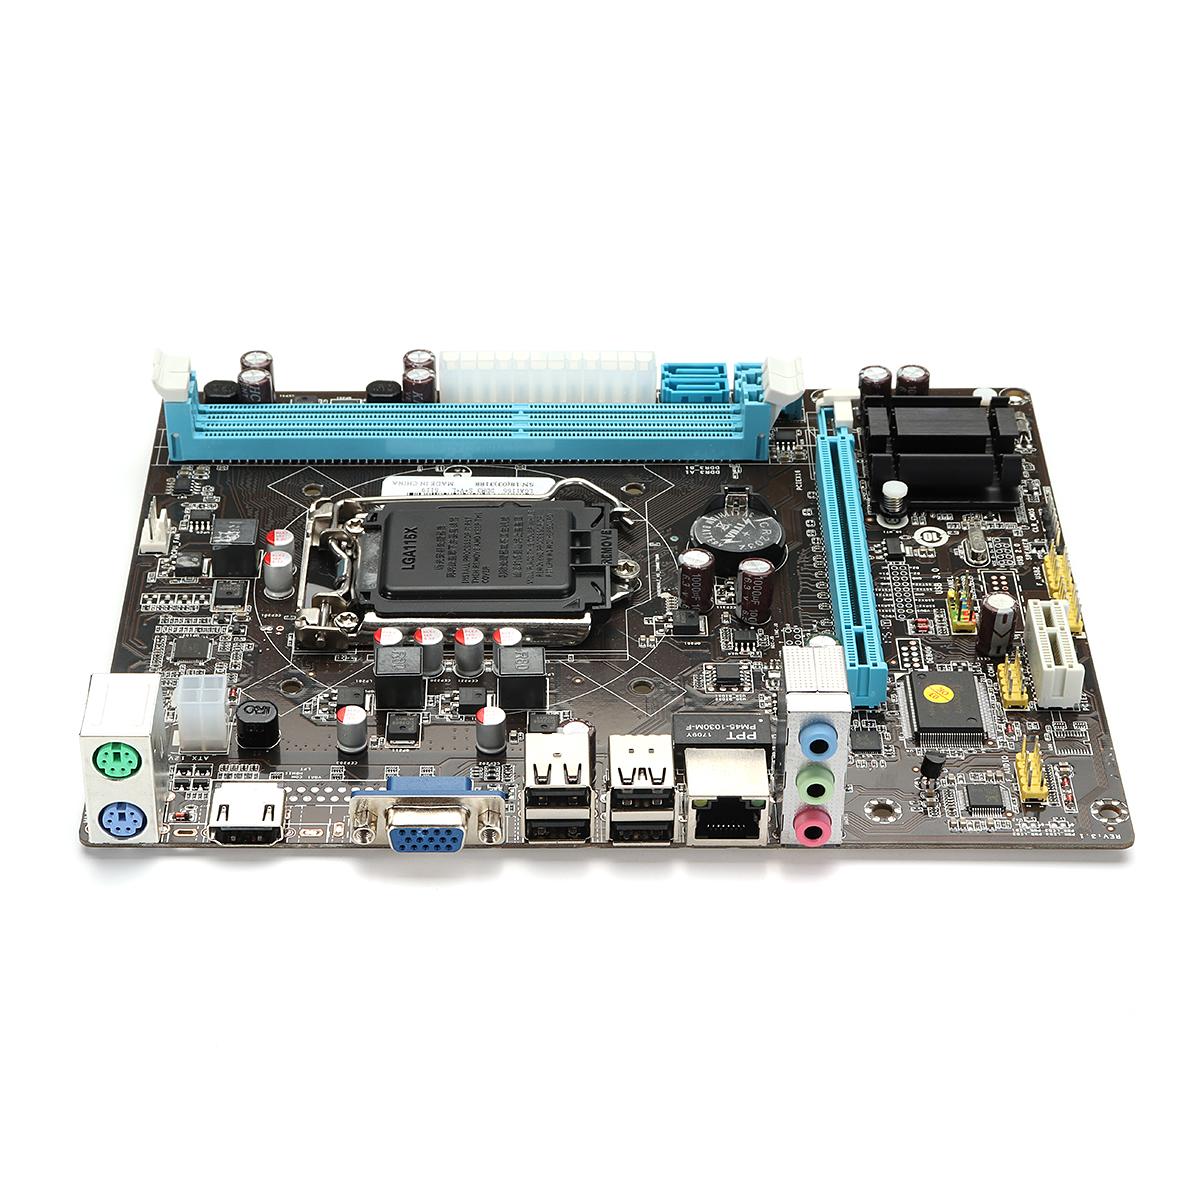 H61/H67/Q65/Q67 Motherboard Support Intel i3/i5/i7 Series CPU